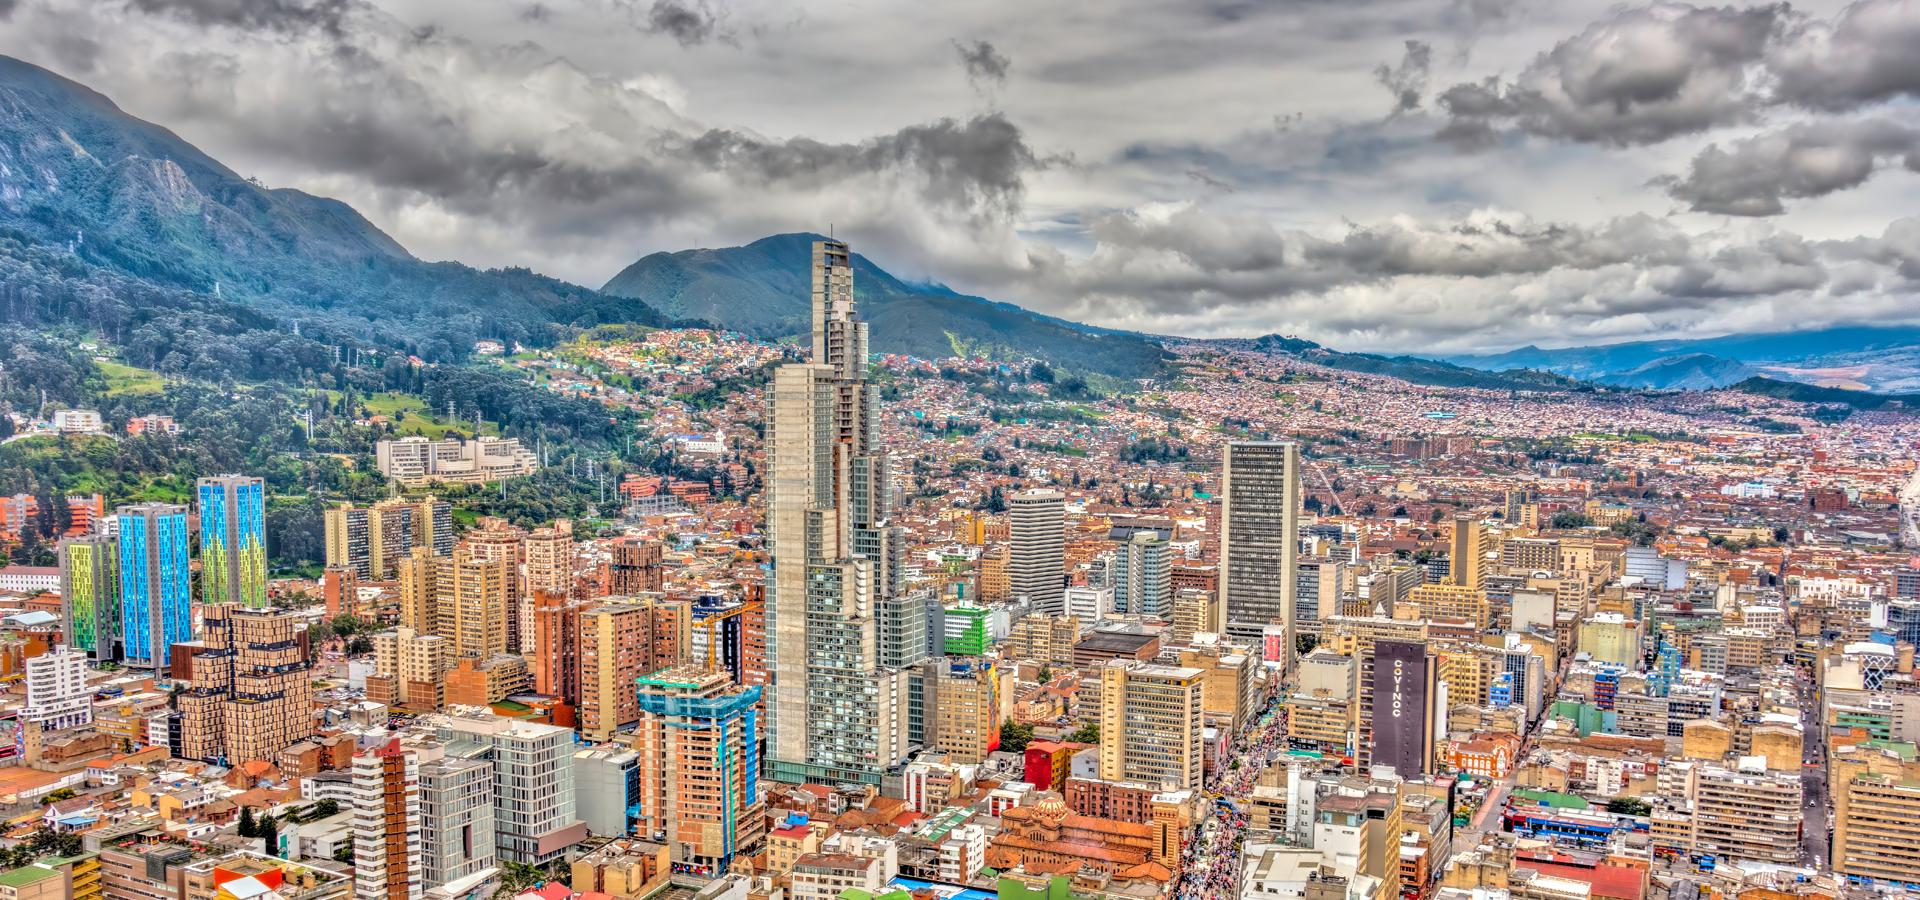 Peer-to-peer advisory in Cali, Valle del Cauca Department, Colombia